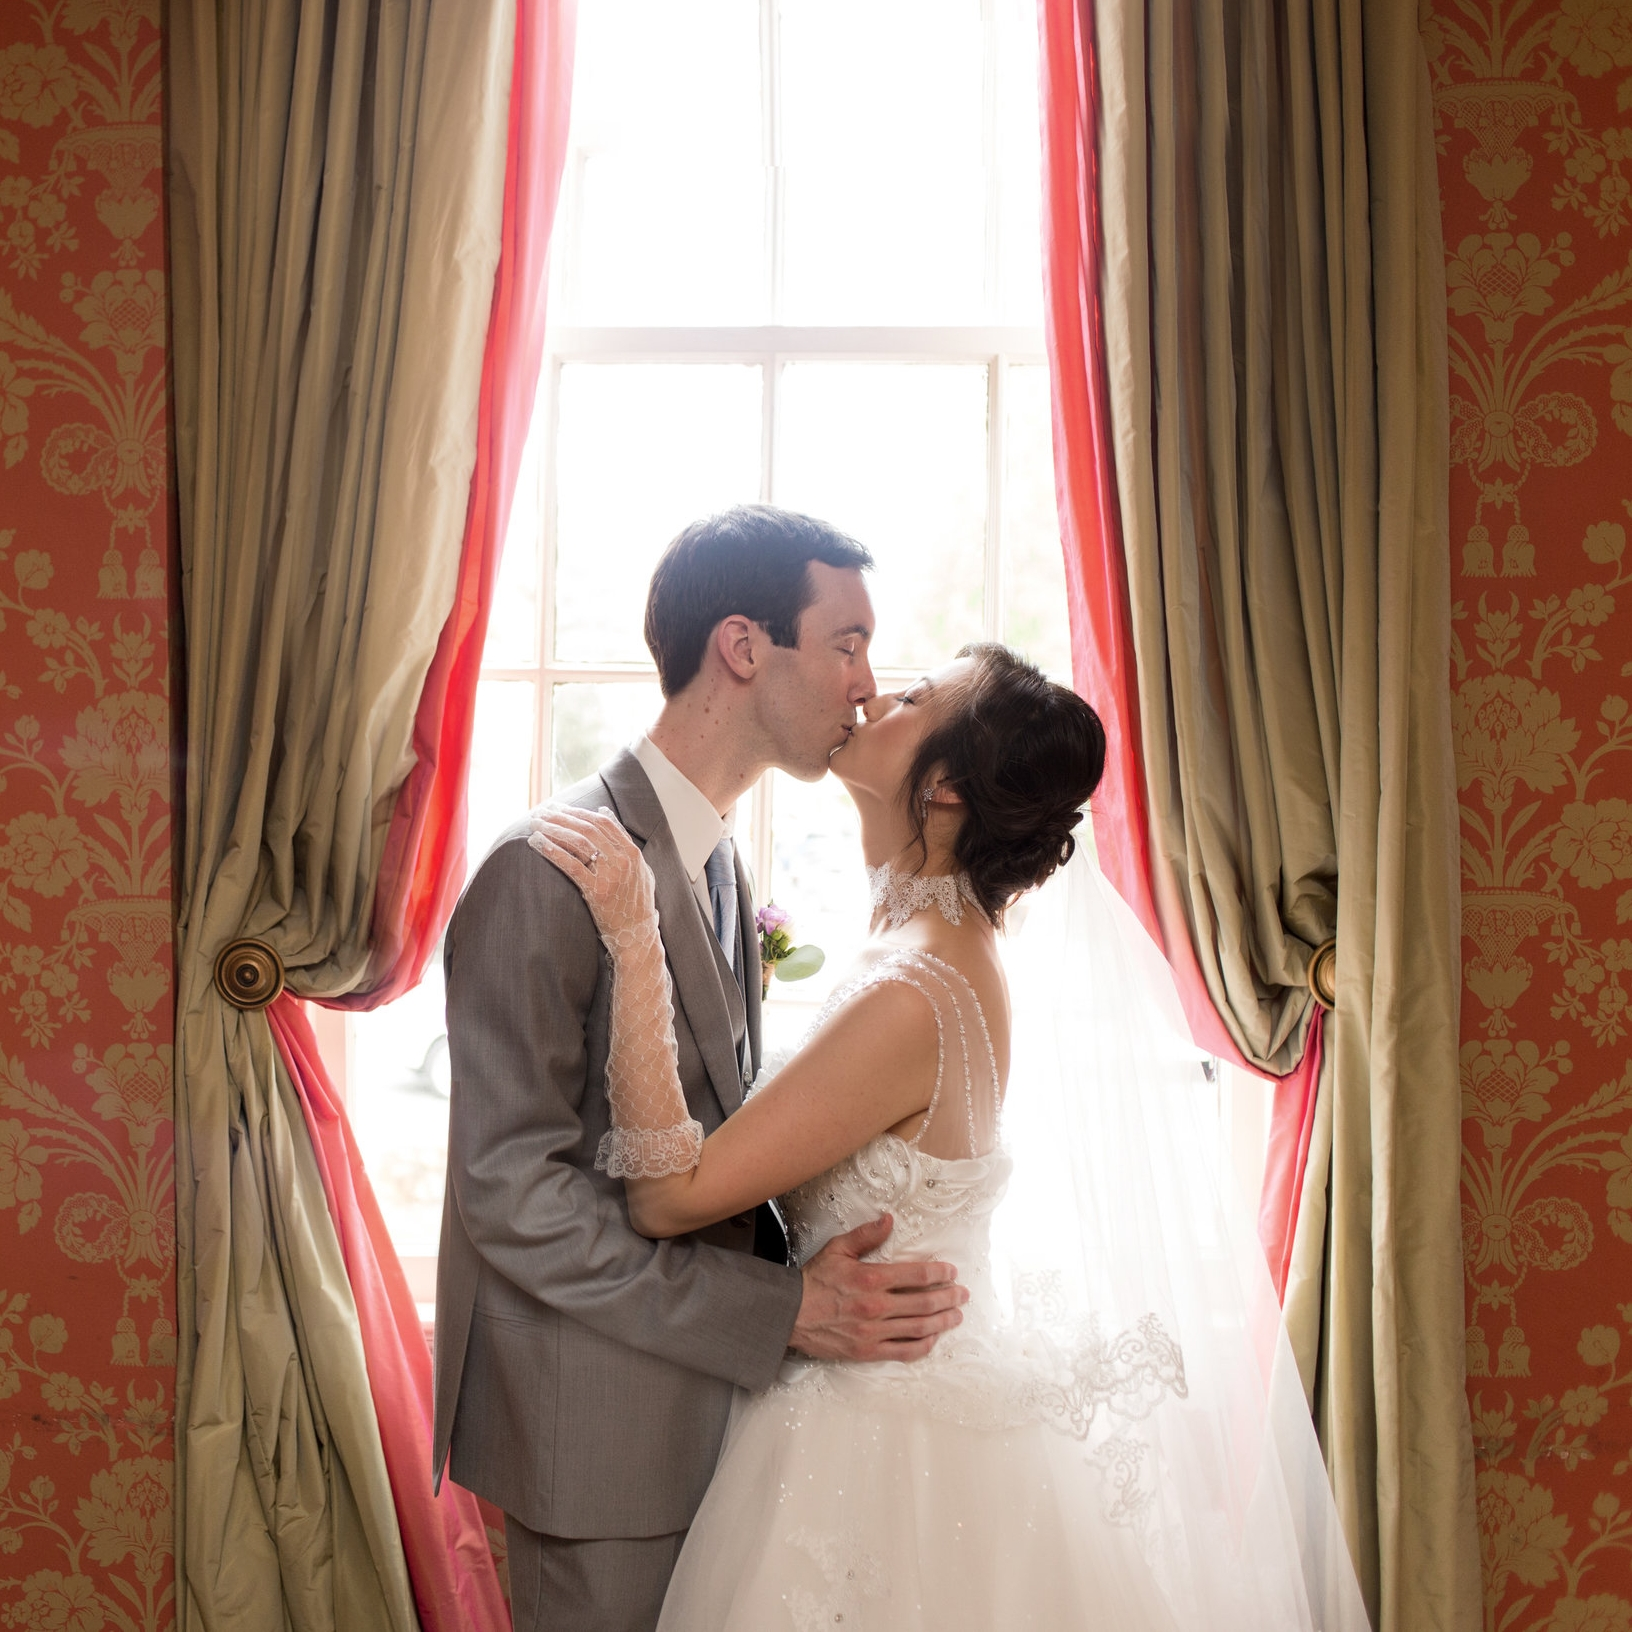 2017_04_30_jenny_jonathans_wedding_couple_portraits-16.jpg